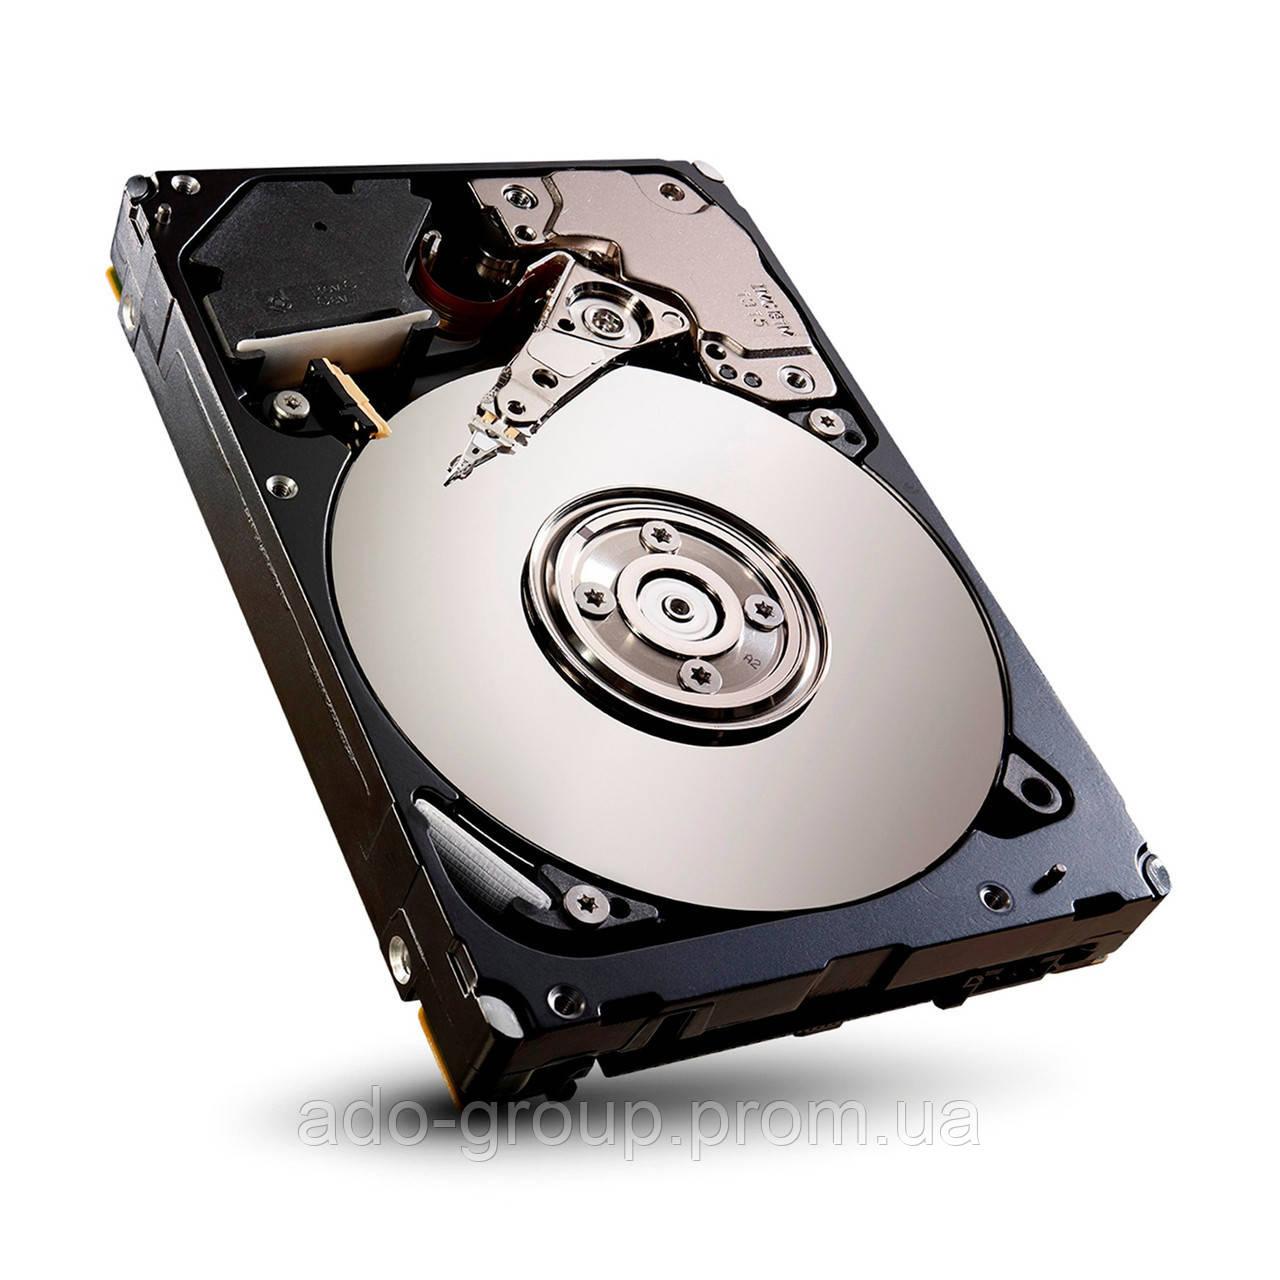 "793773-001 Жесткий диск HP 8000GB SAS 7.2K  3.5"" +"